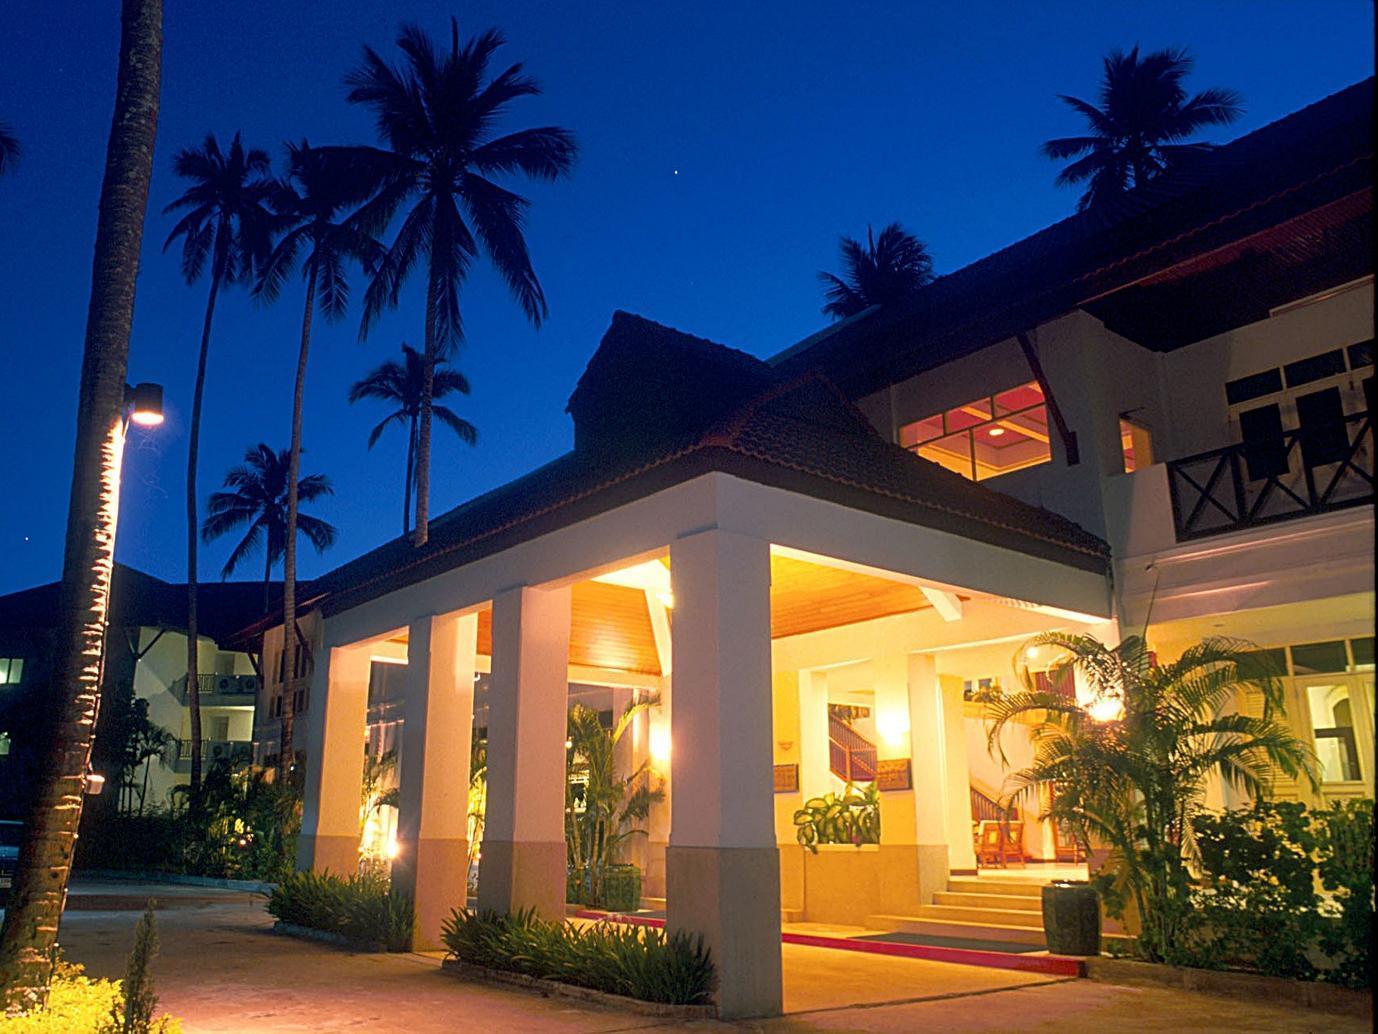 Amora Beach Resort 4 (Thailand, Phuket): photos, room description, service, tips and tourist reviews 77